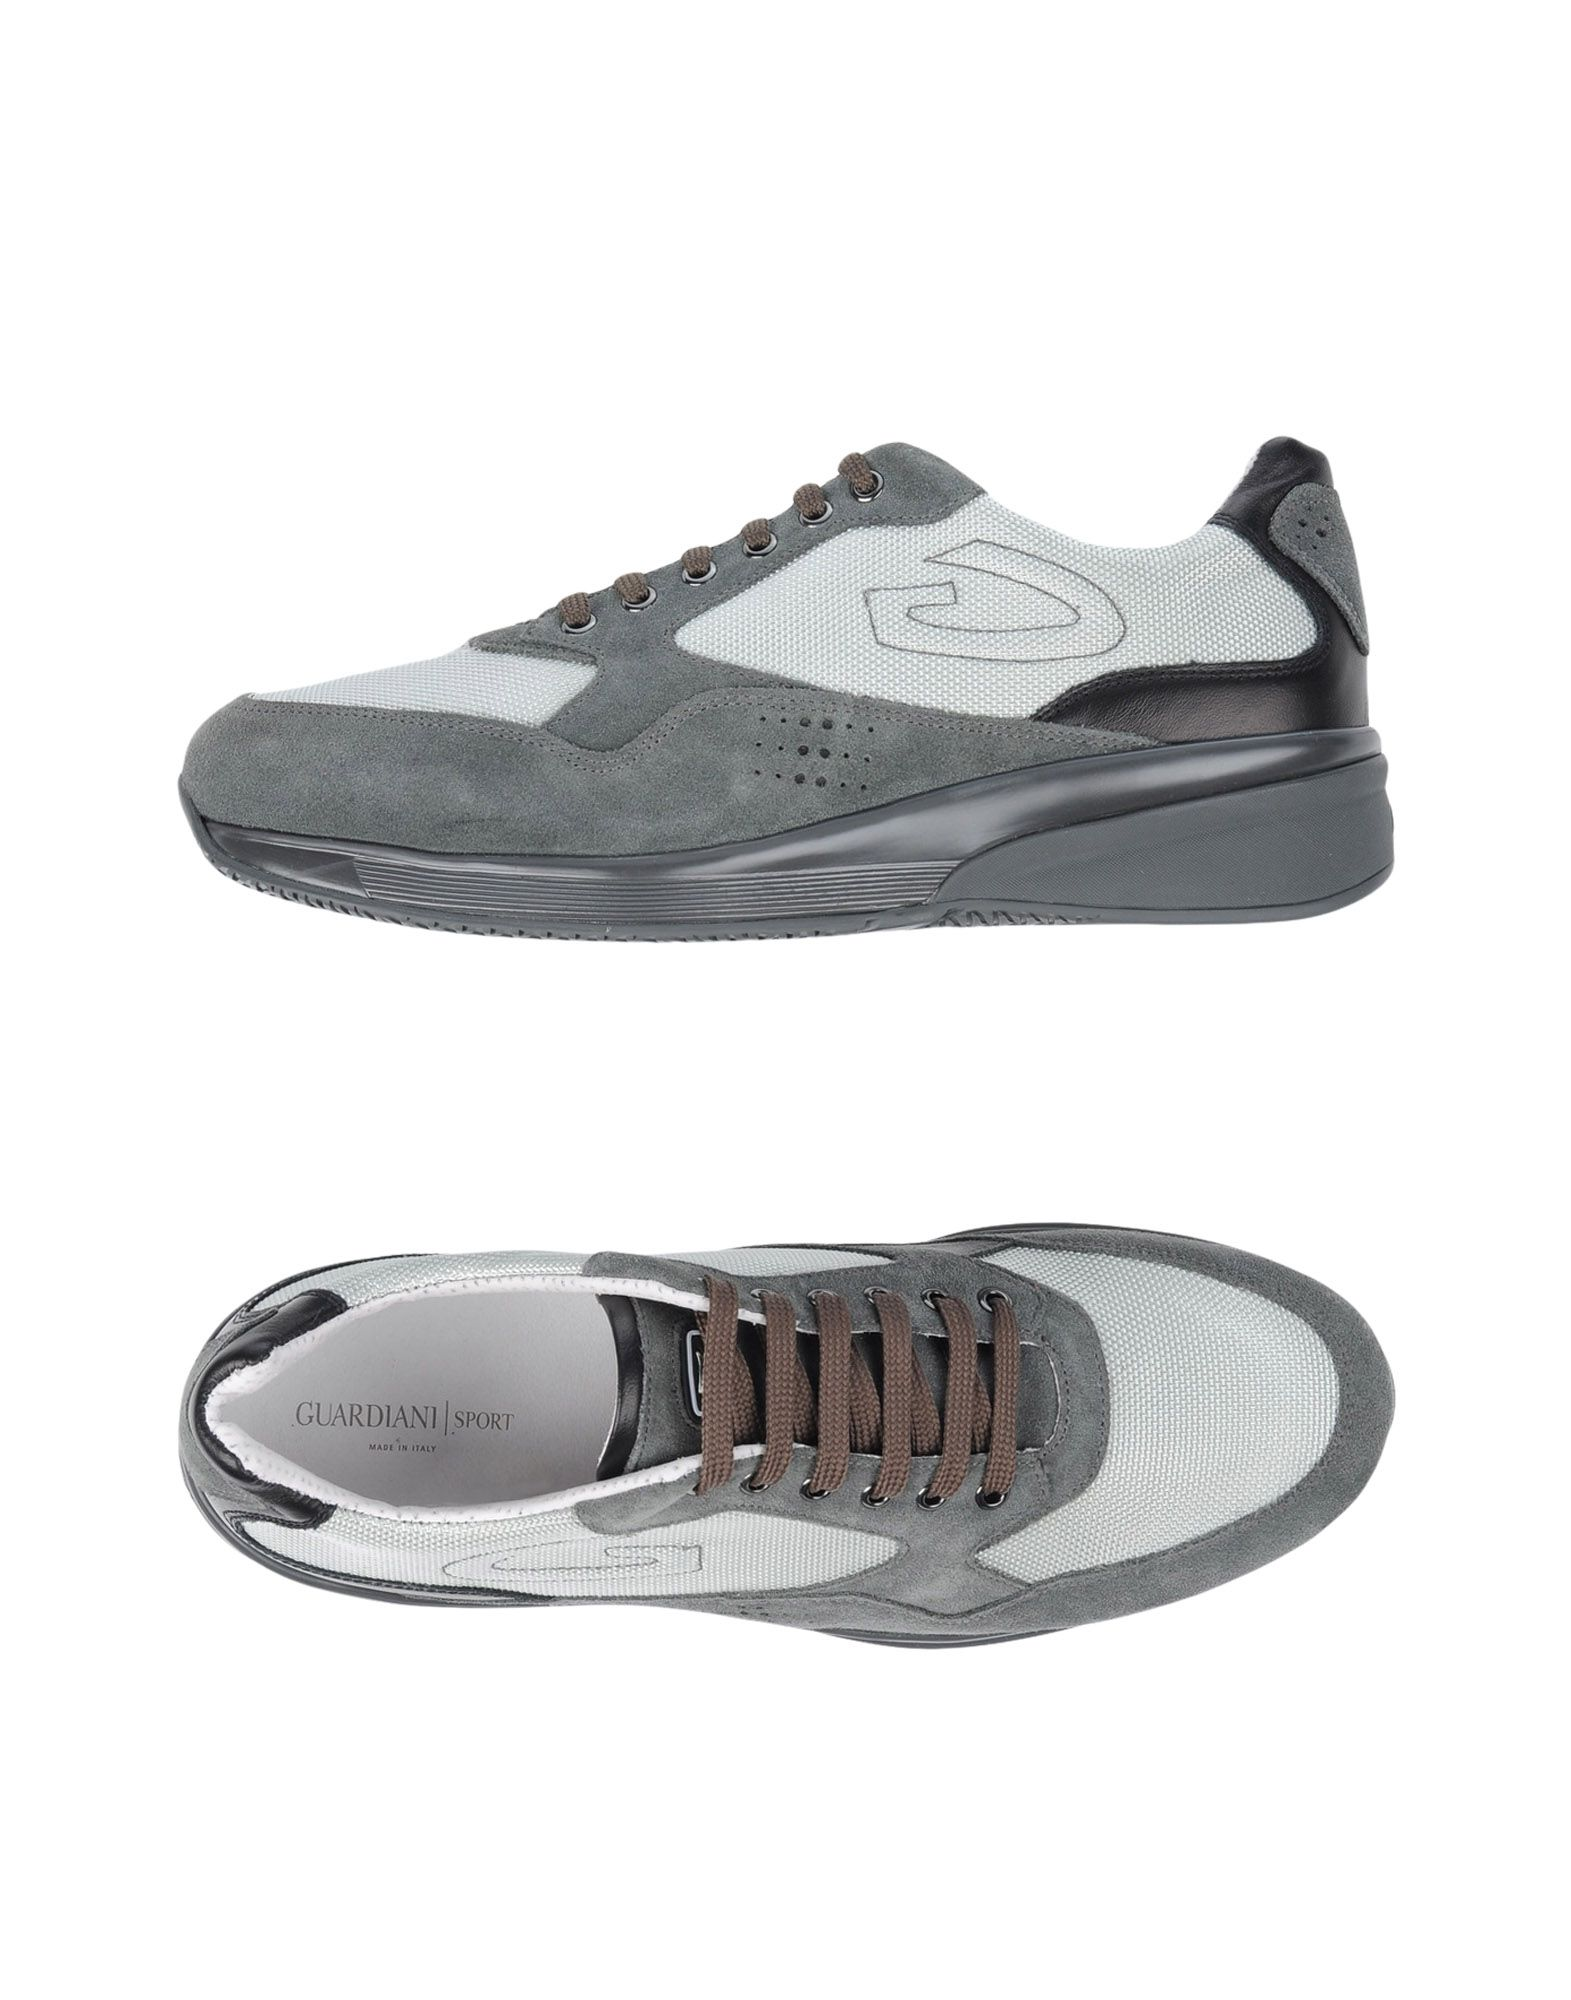 Alberto Guardiani Sneakers Sneakers - Men Alberto Guardiani Sneakers Sneakers online on  United Kingdom - 11272257VM 069bfd